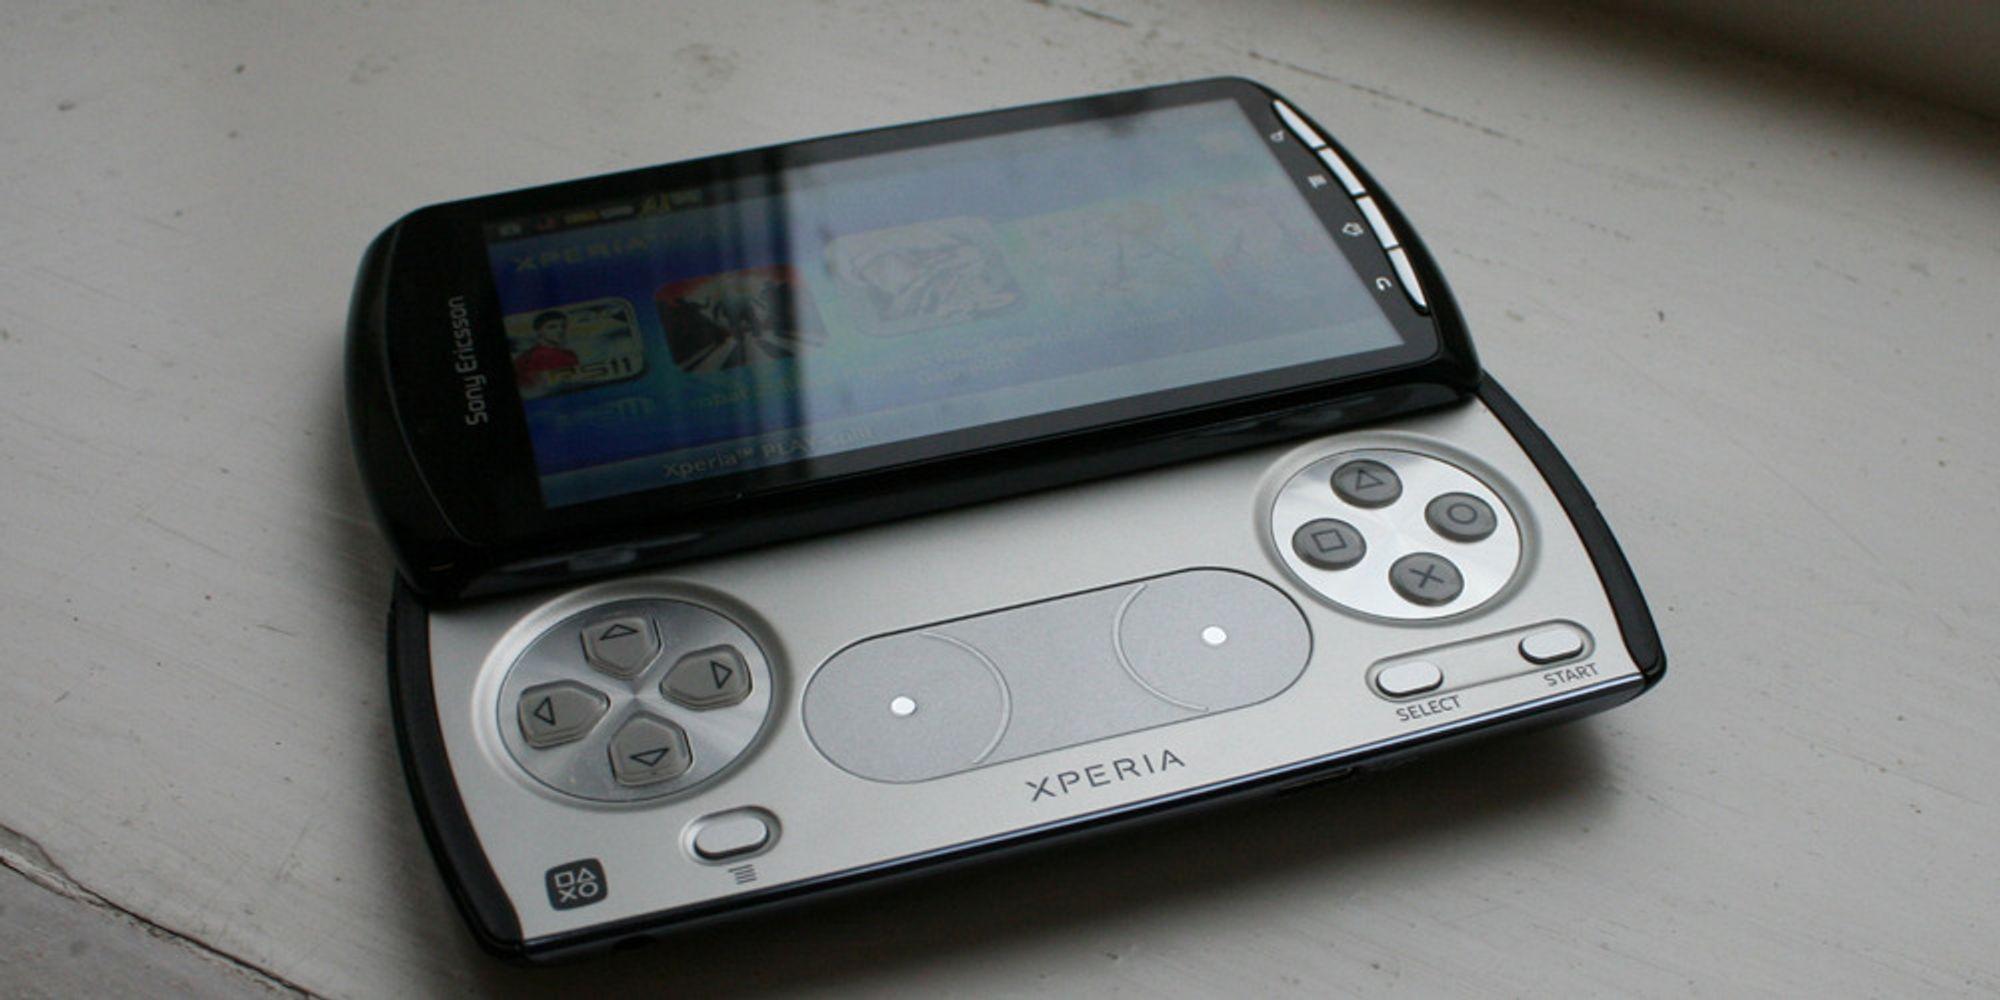 TEST: Test av Sony Ericsson Xperia Play